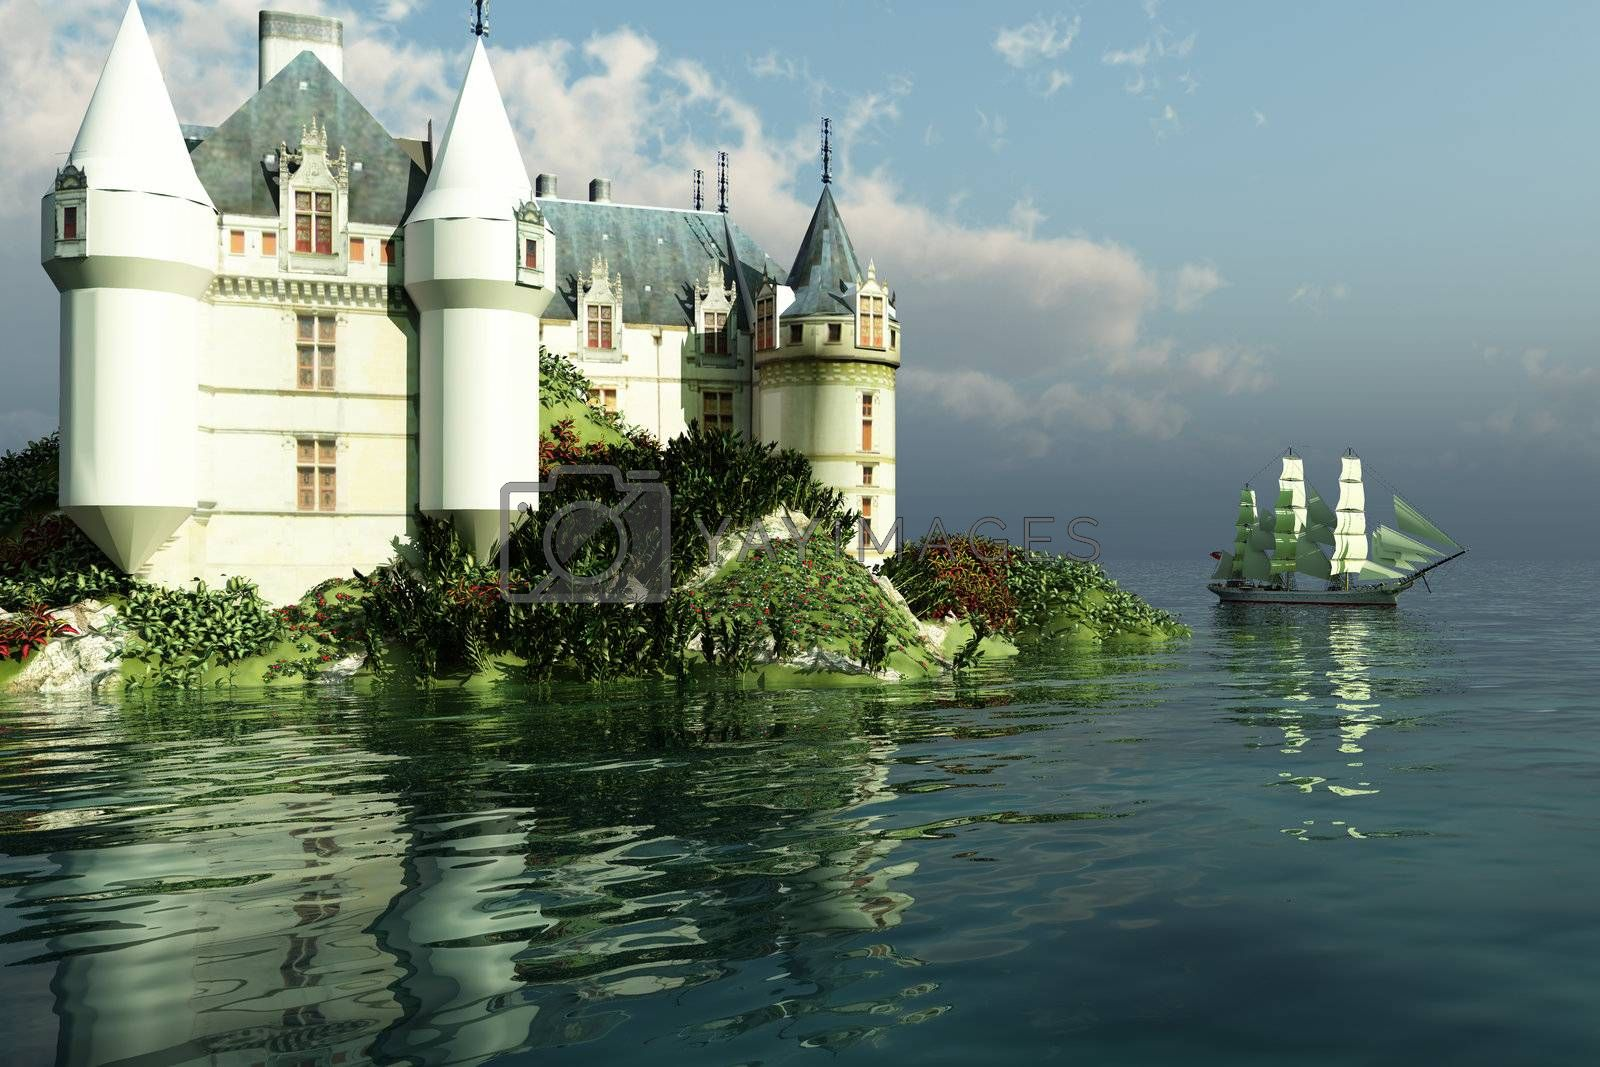 A clipper ship sails past a grand castle.